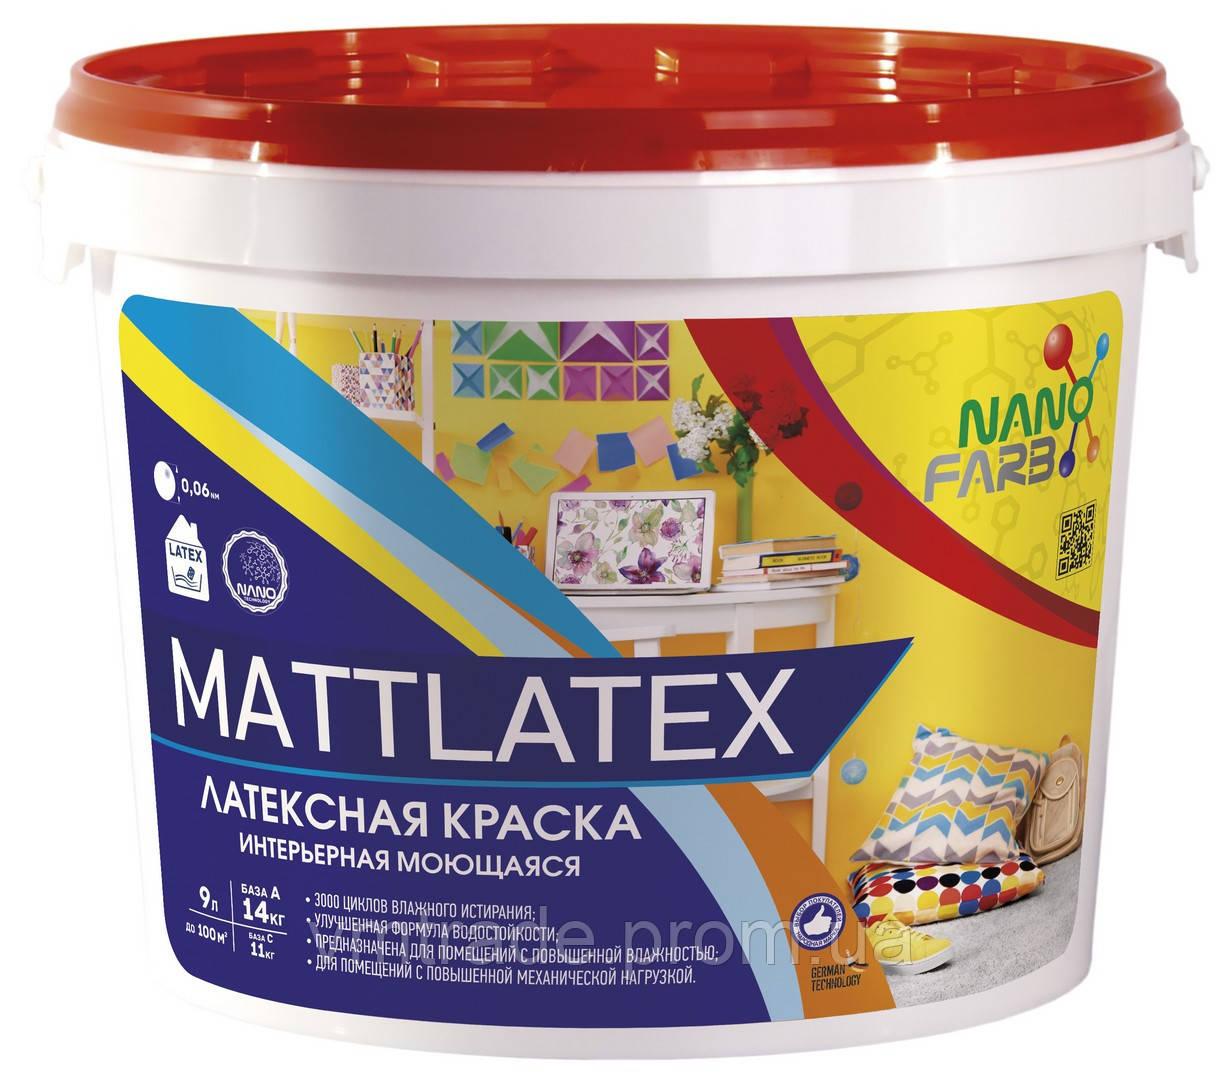 Краска интерьерная акриловая латексная Mattlatex НаноФарб (NanoFarb) 14 кг